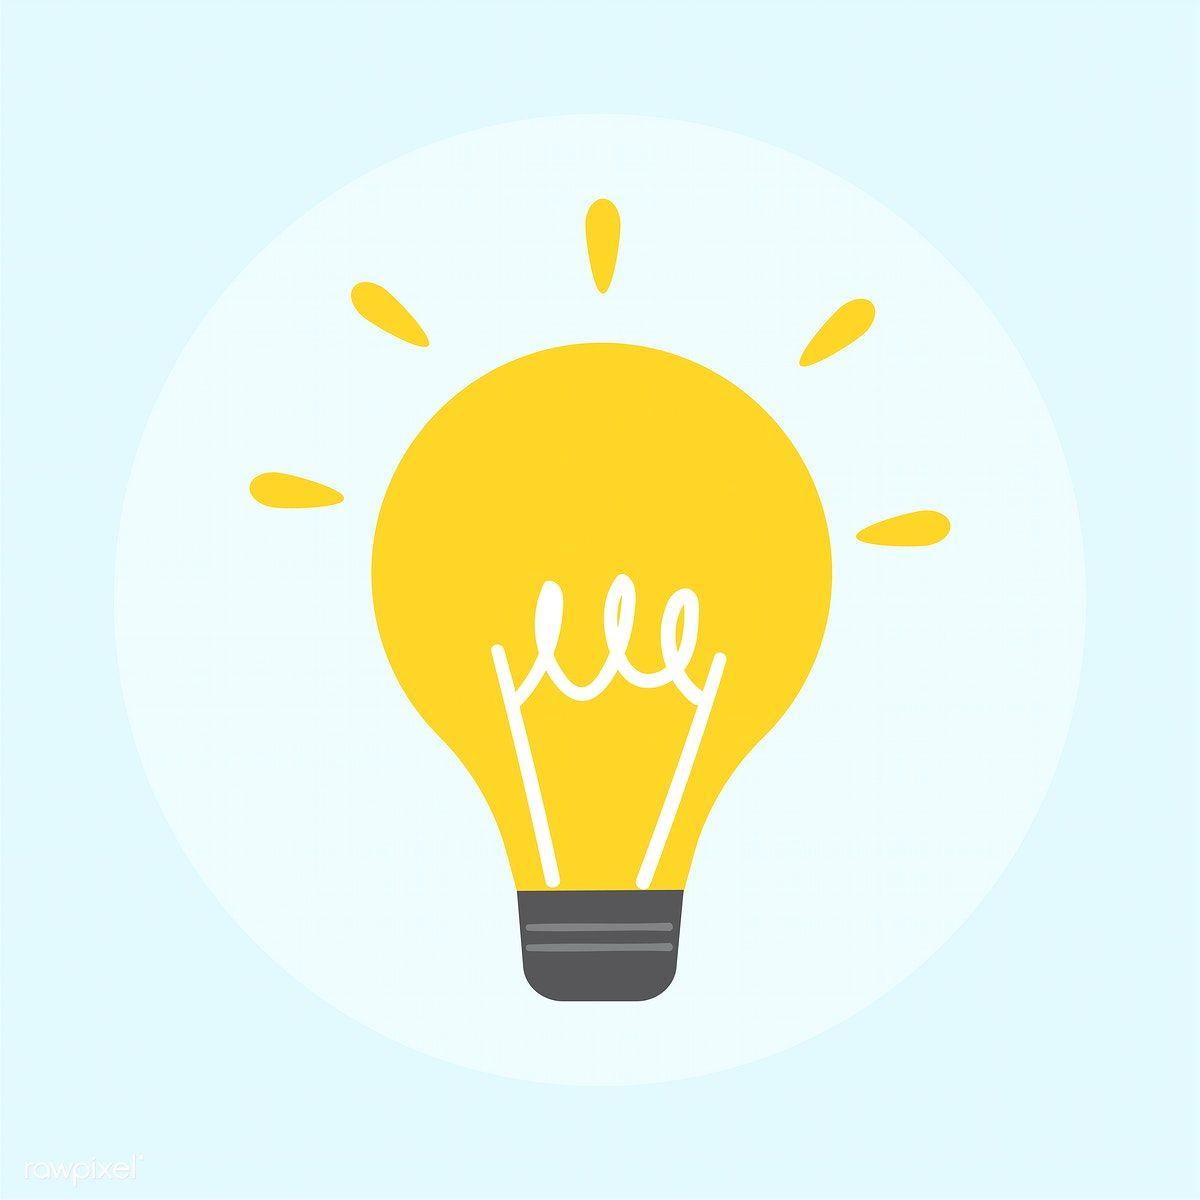 Download Premium Vector Of Illustration Of Light Bulb Icon 401031 Light Bulb Icon Light Bulb Illustration Light Icon